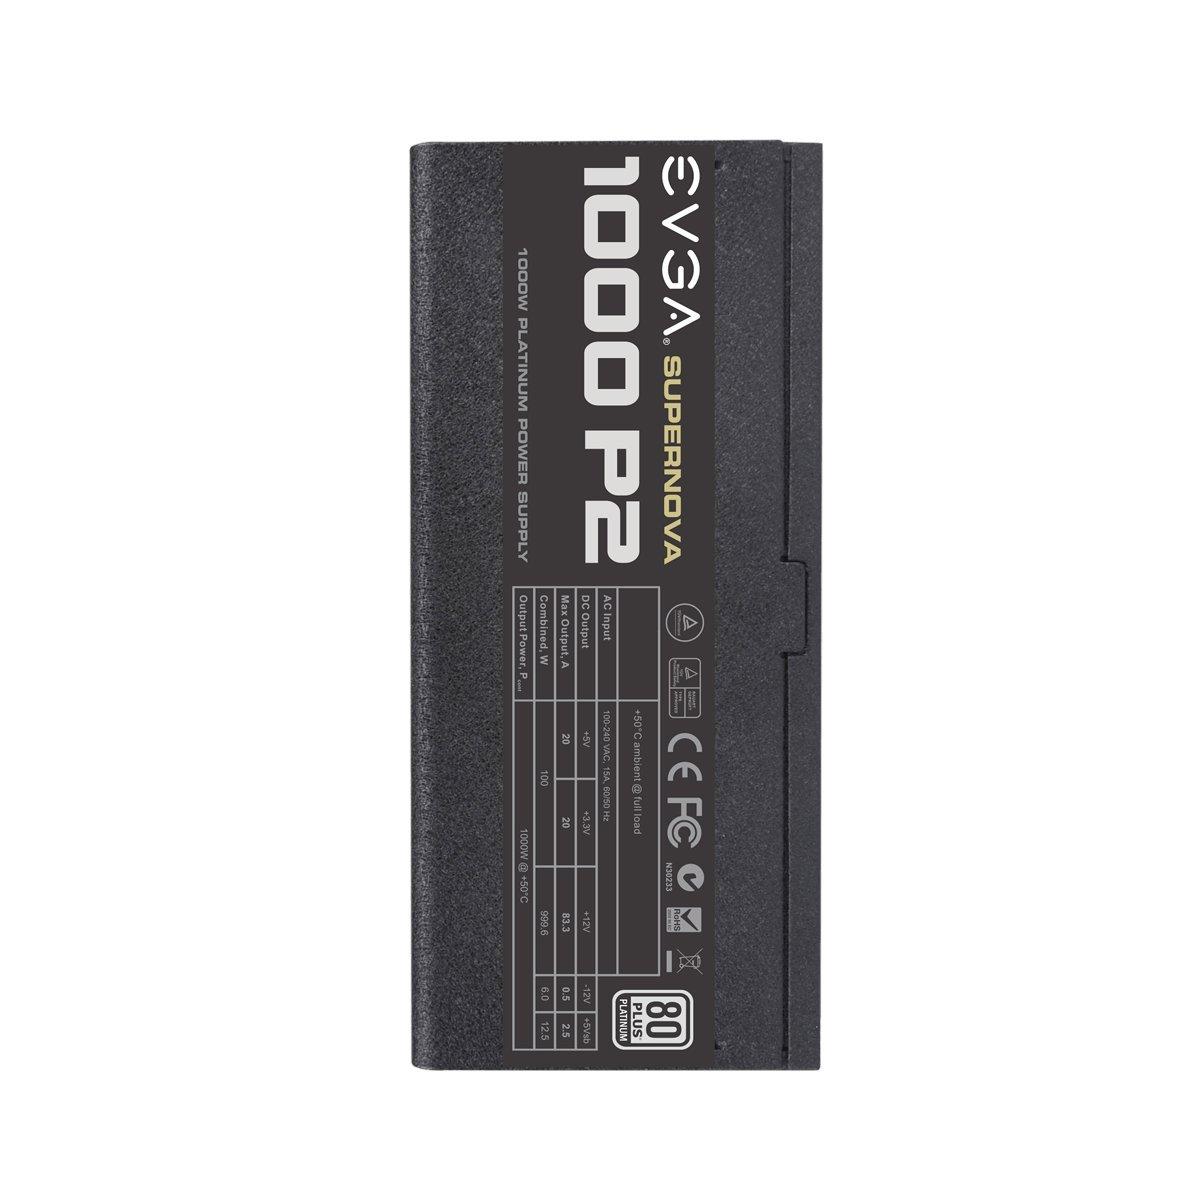 EVGA ECO Mode 80+ PLATINUM 850W Includes FREE Power On Self Tester Power Supply 220-P2-0850-X3 Black EVGA SuperNOVA 850 P2 Fully Modular